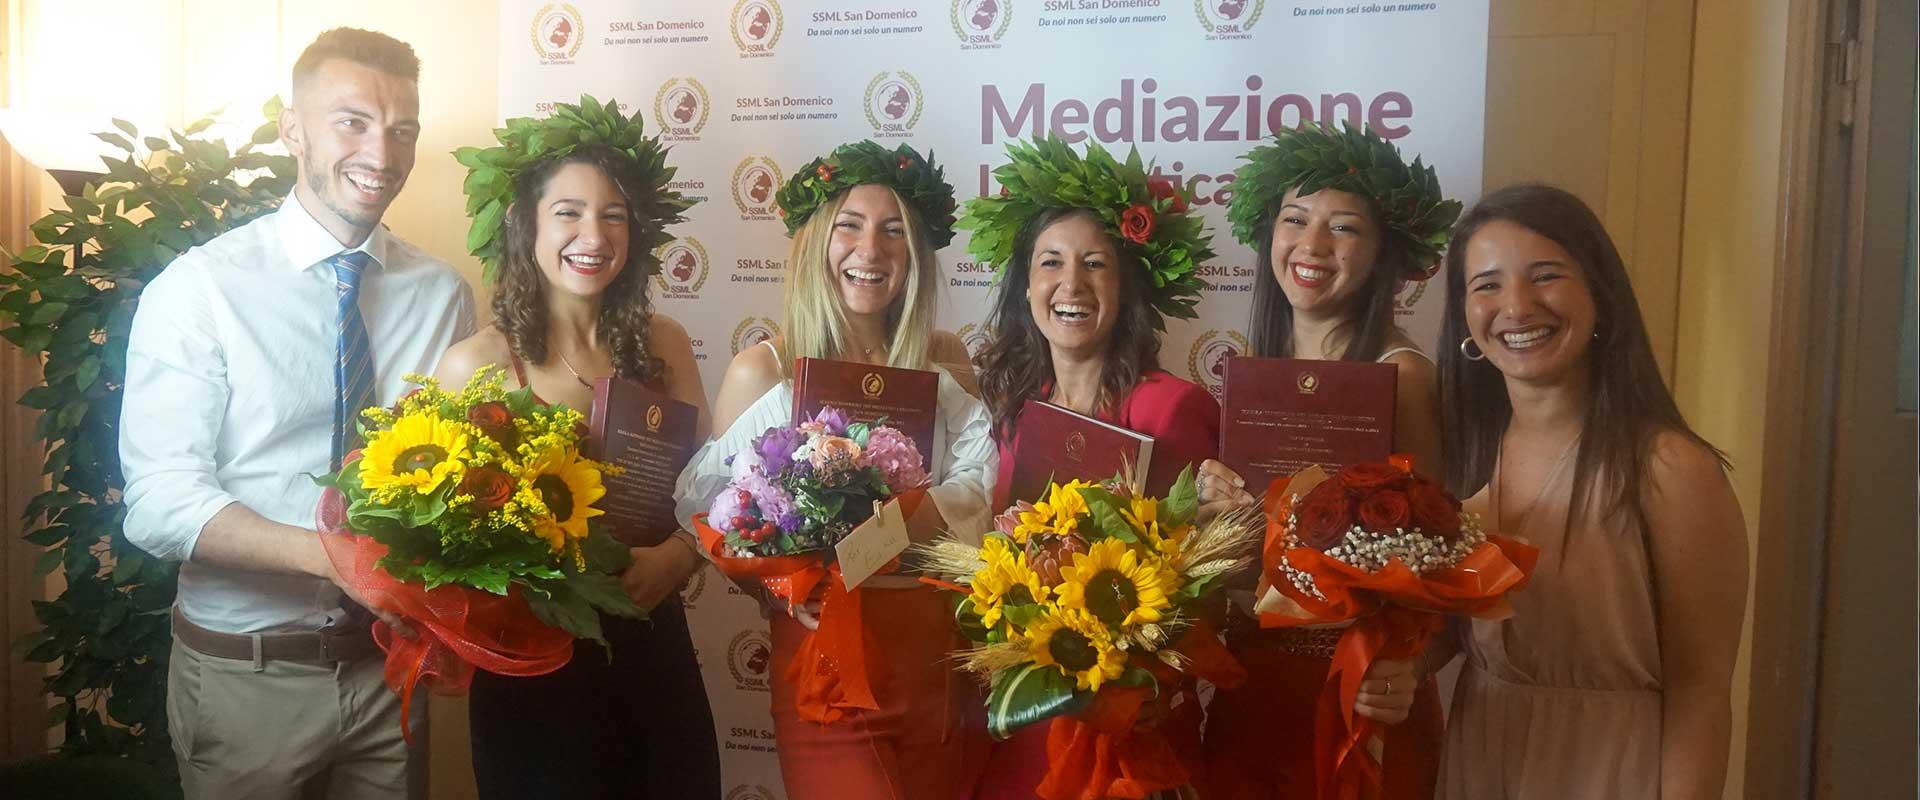 mediazione-linguistica-roma